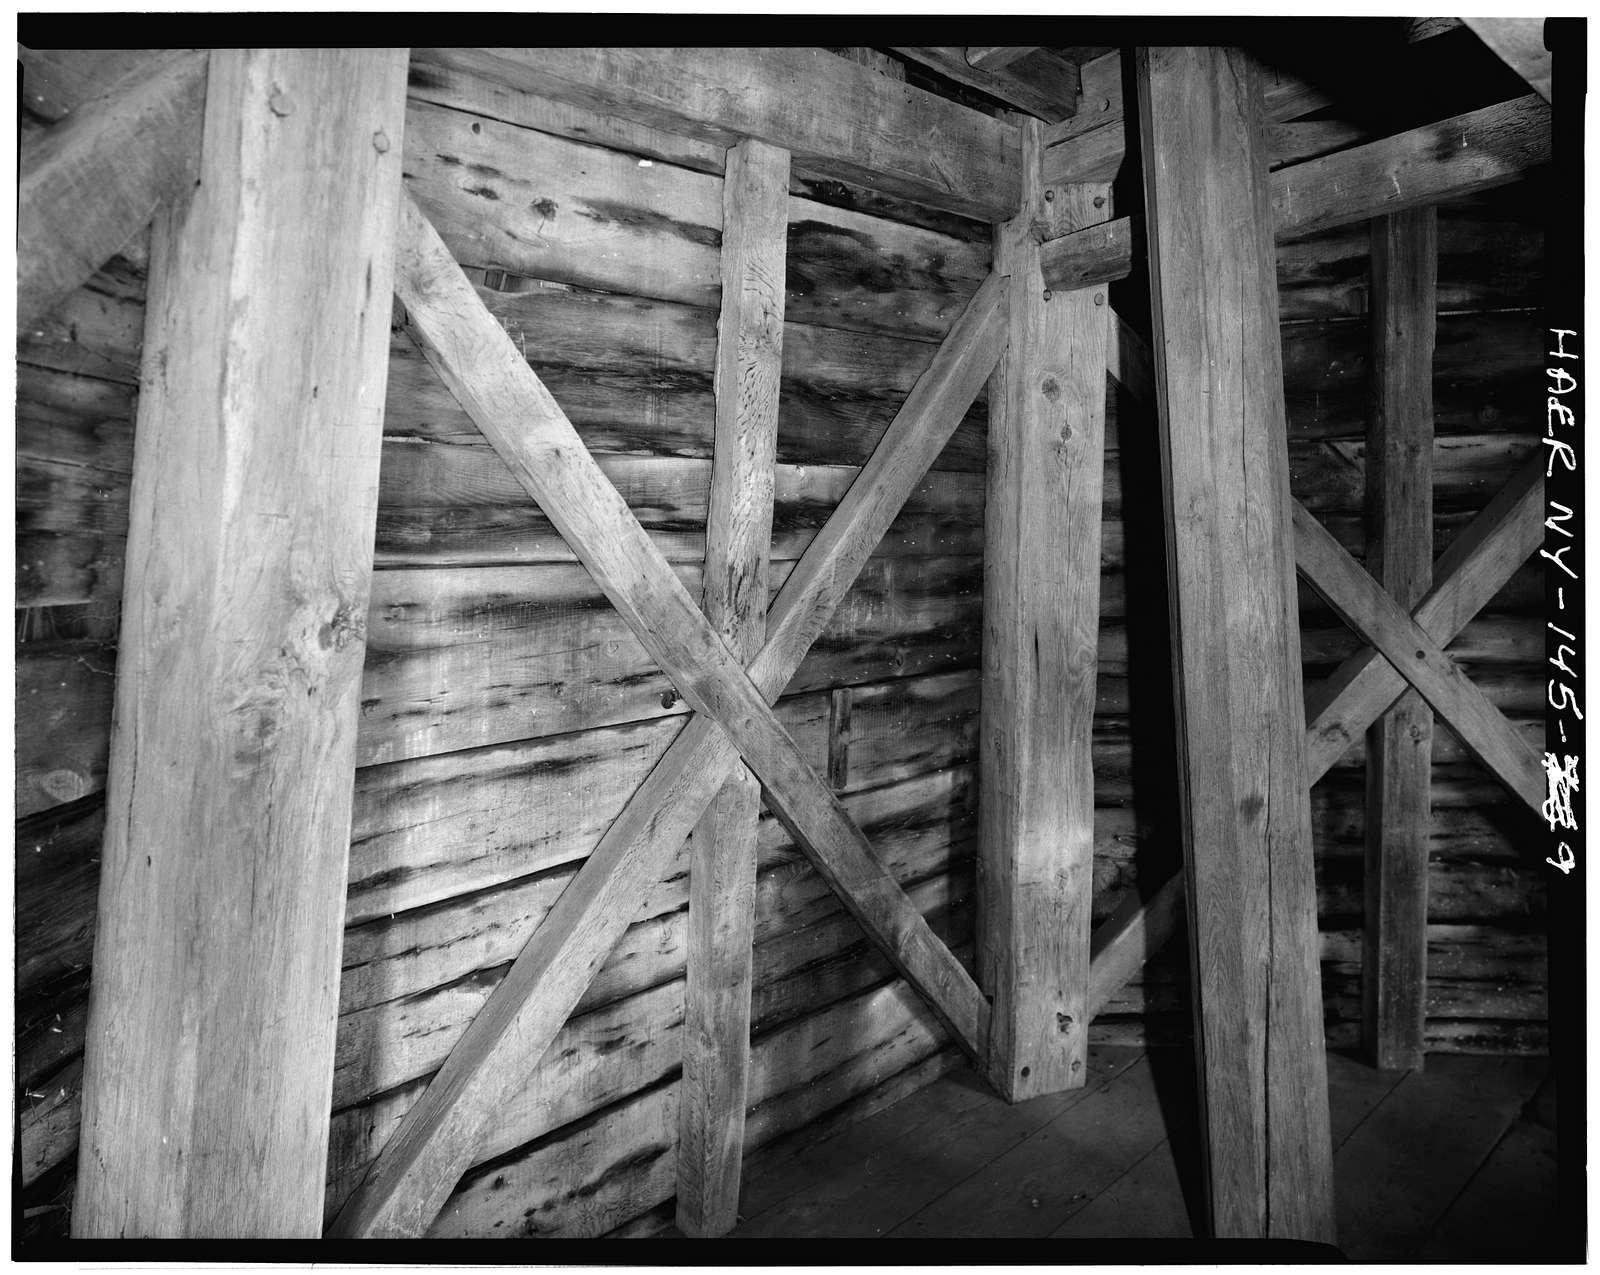 Shelter Island Windmill, Manwaring Road, Shelter Island, Suffolk County, NY